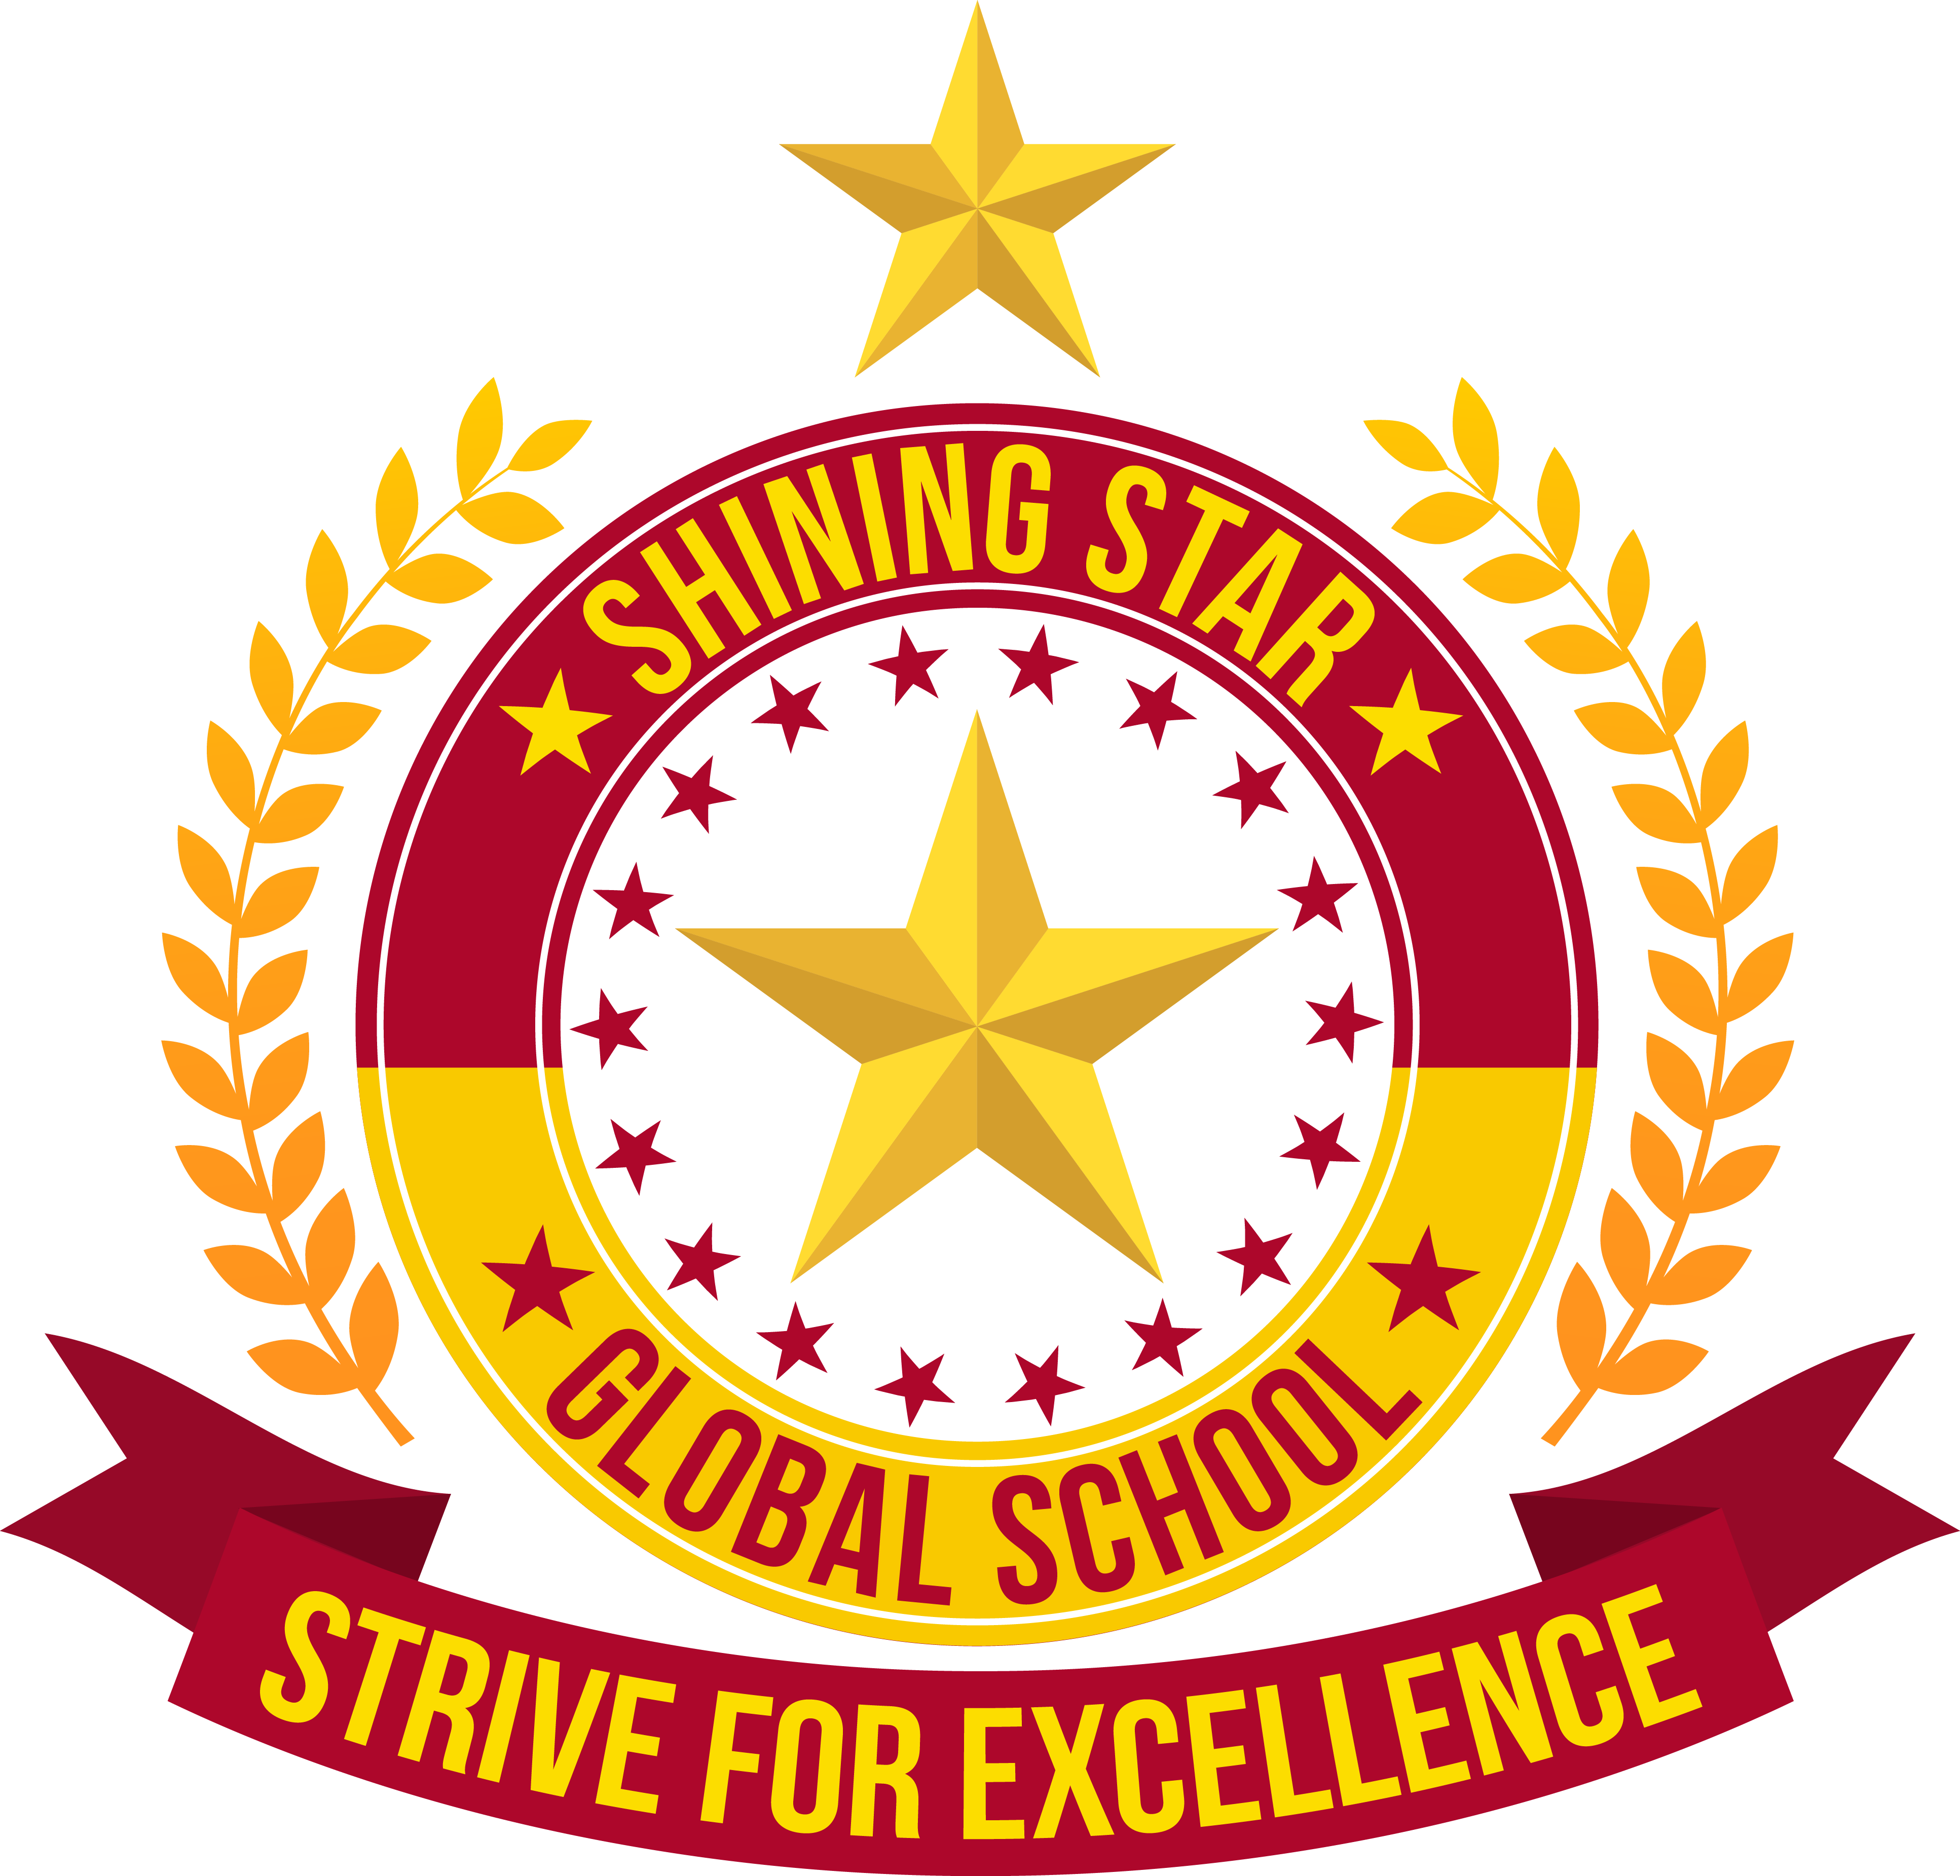 Pin Shining Star Badges On Pinterest.